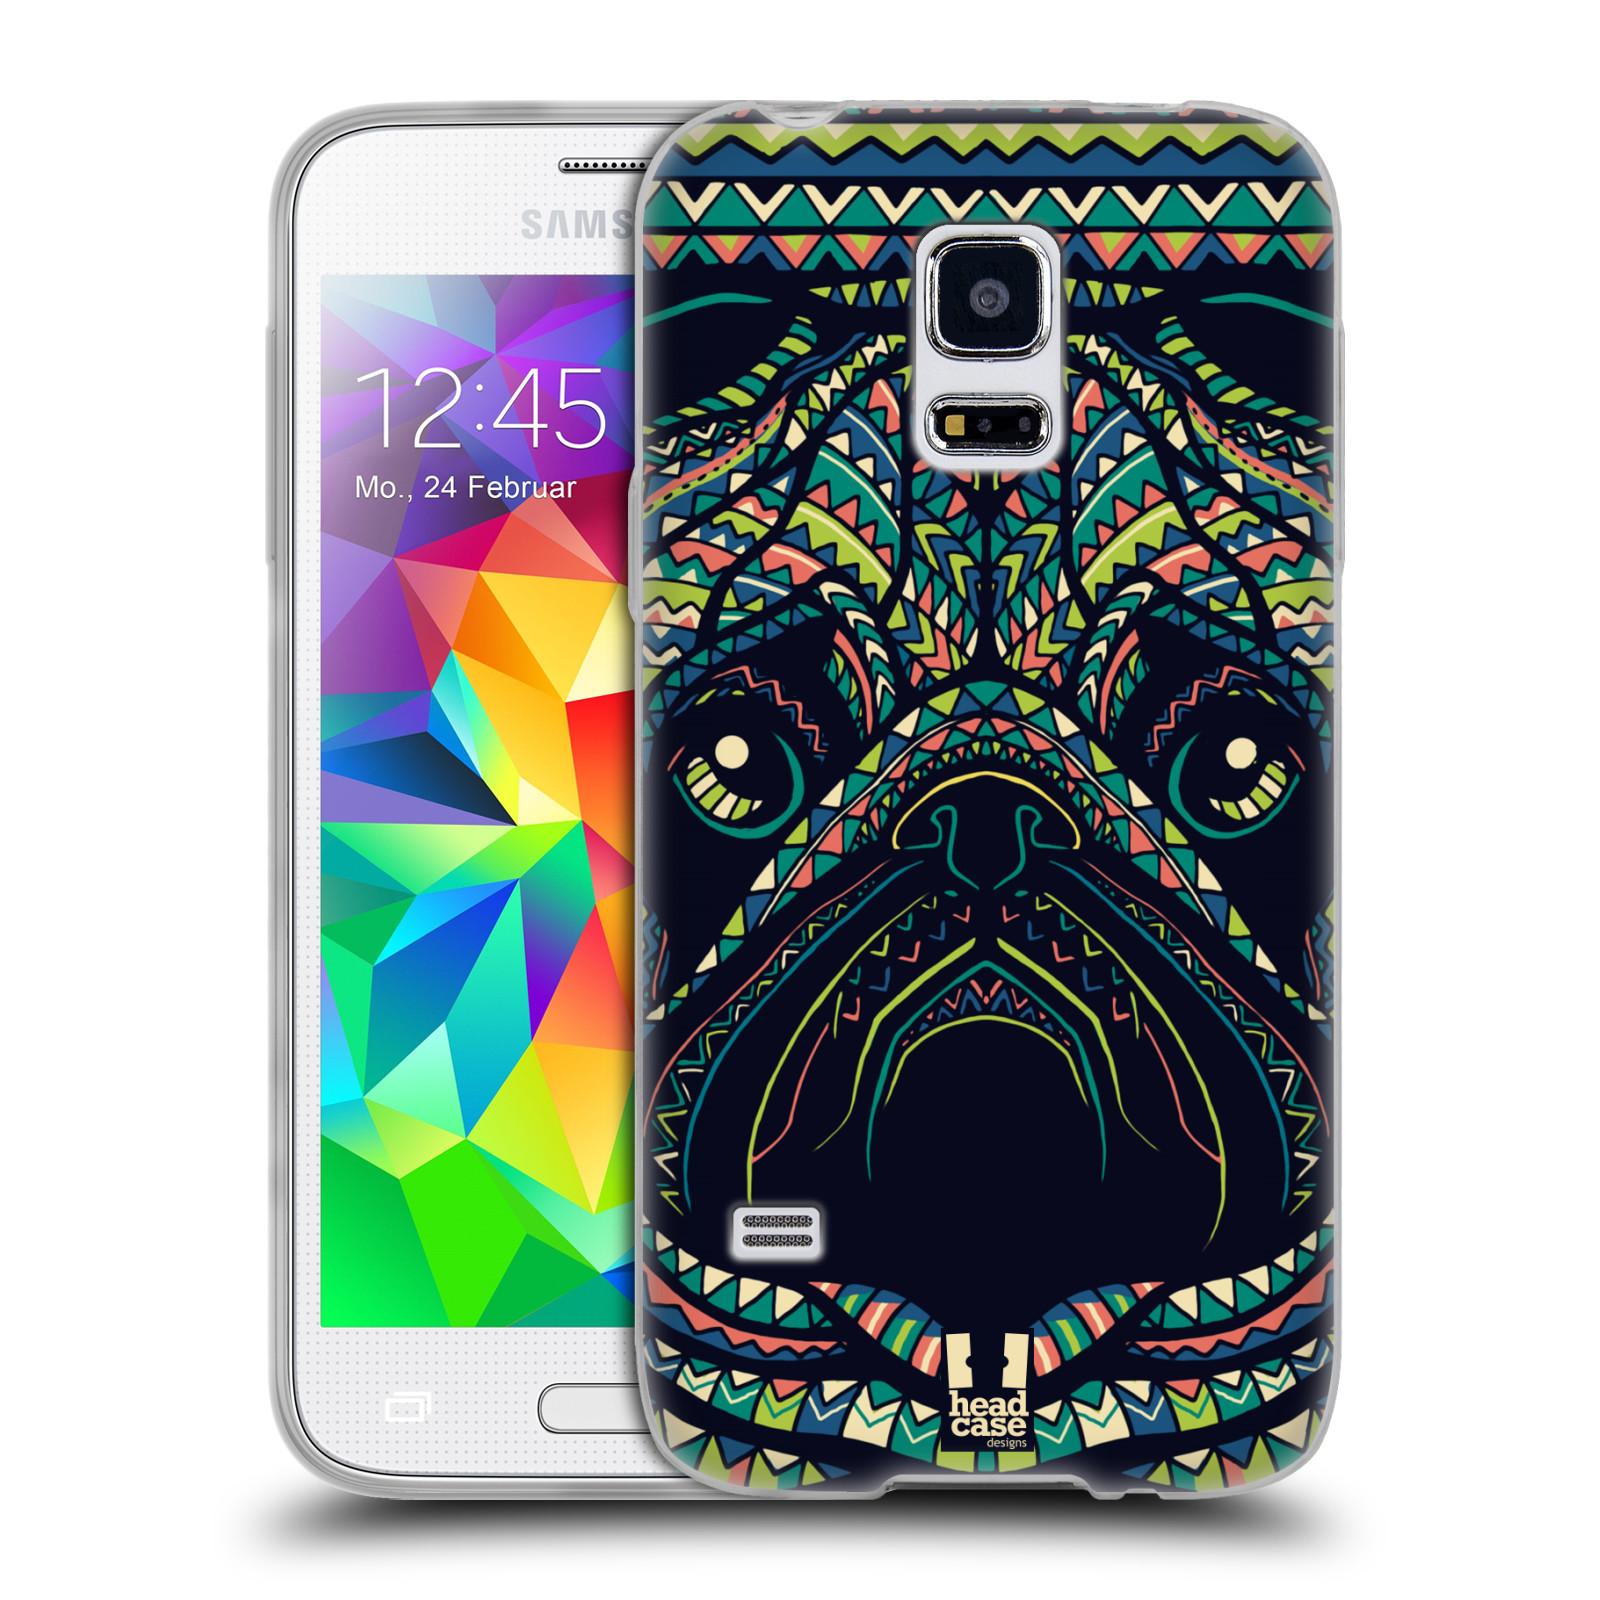 HEAD CASE silikonový obal na mobil Samsung Galaxy S5 MINI vzor Aztécký motiv zvíře 3 mopsík